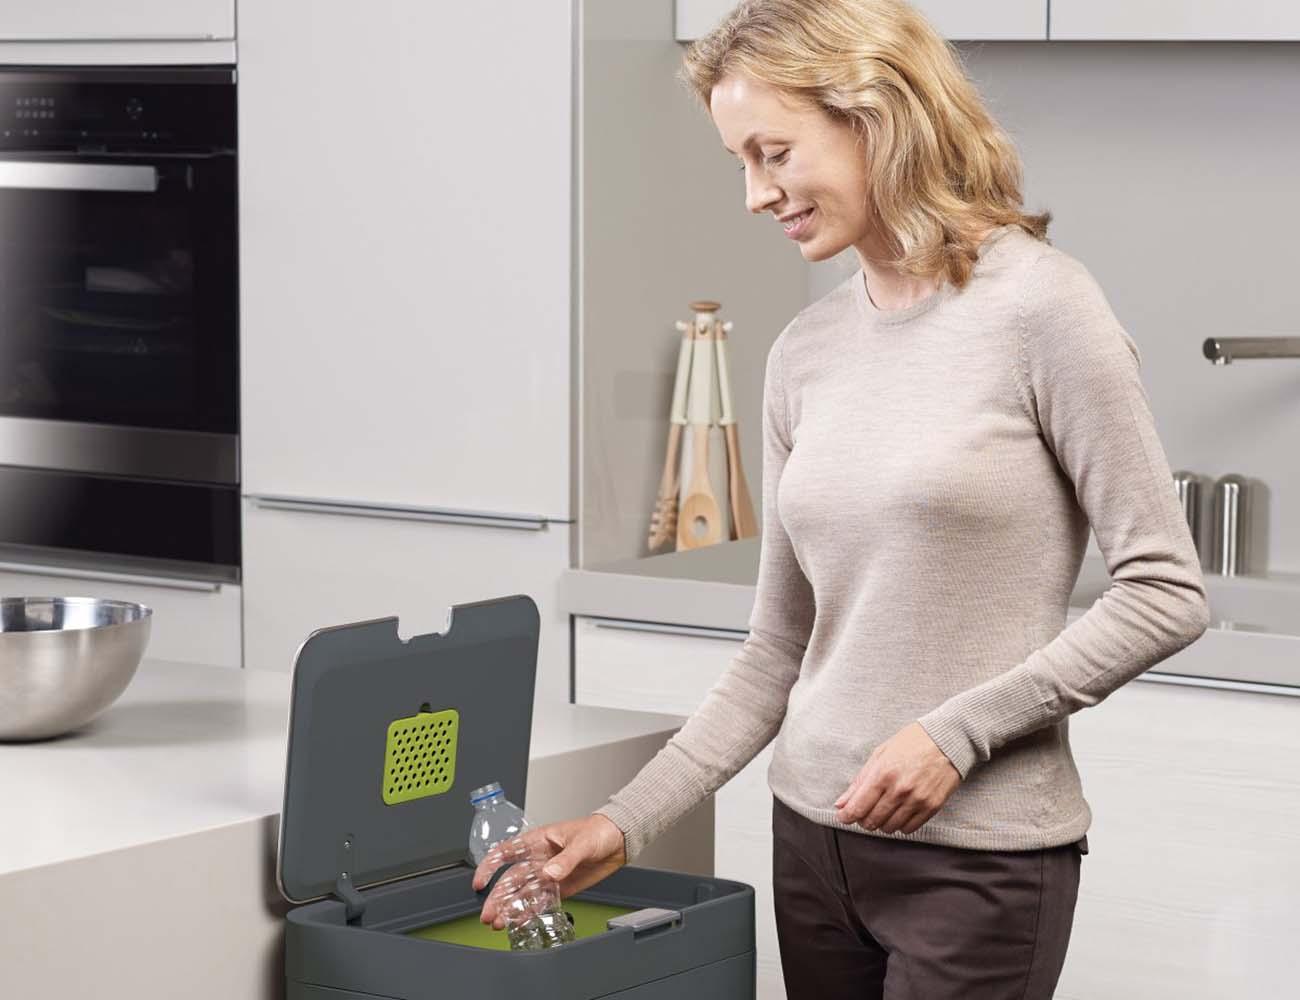 Totem Intelligent Waste System by Joseph Joseph